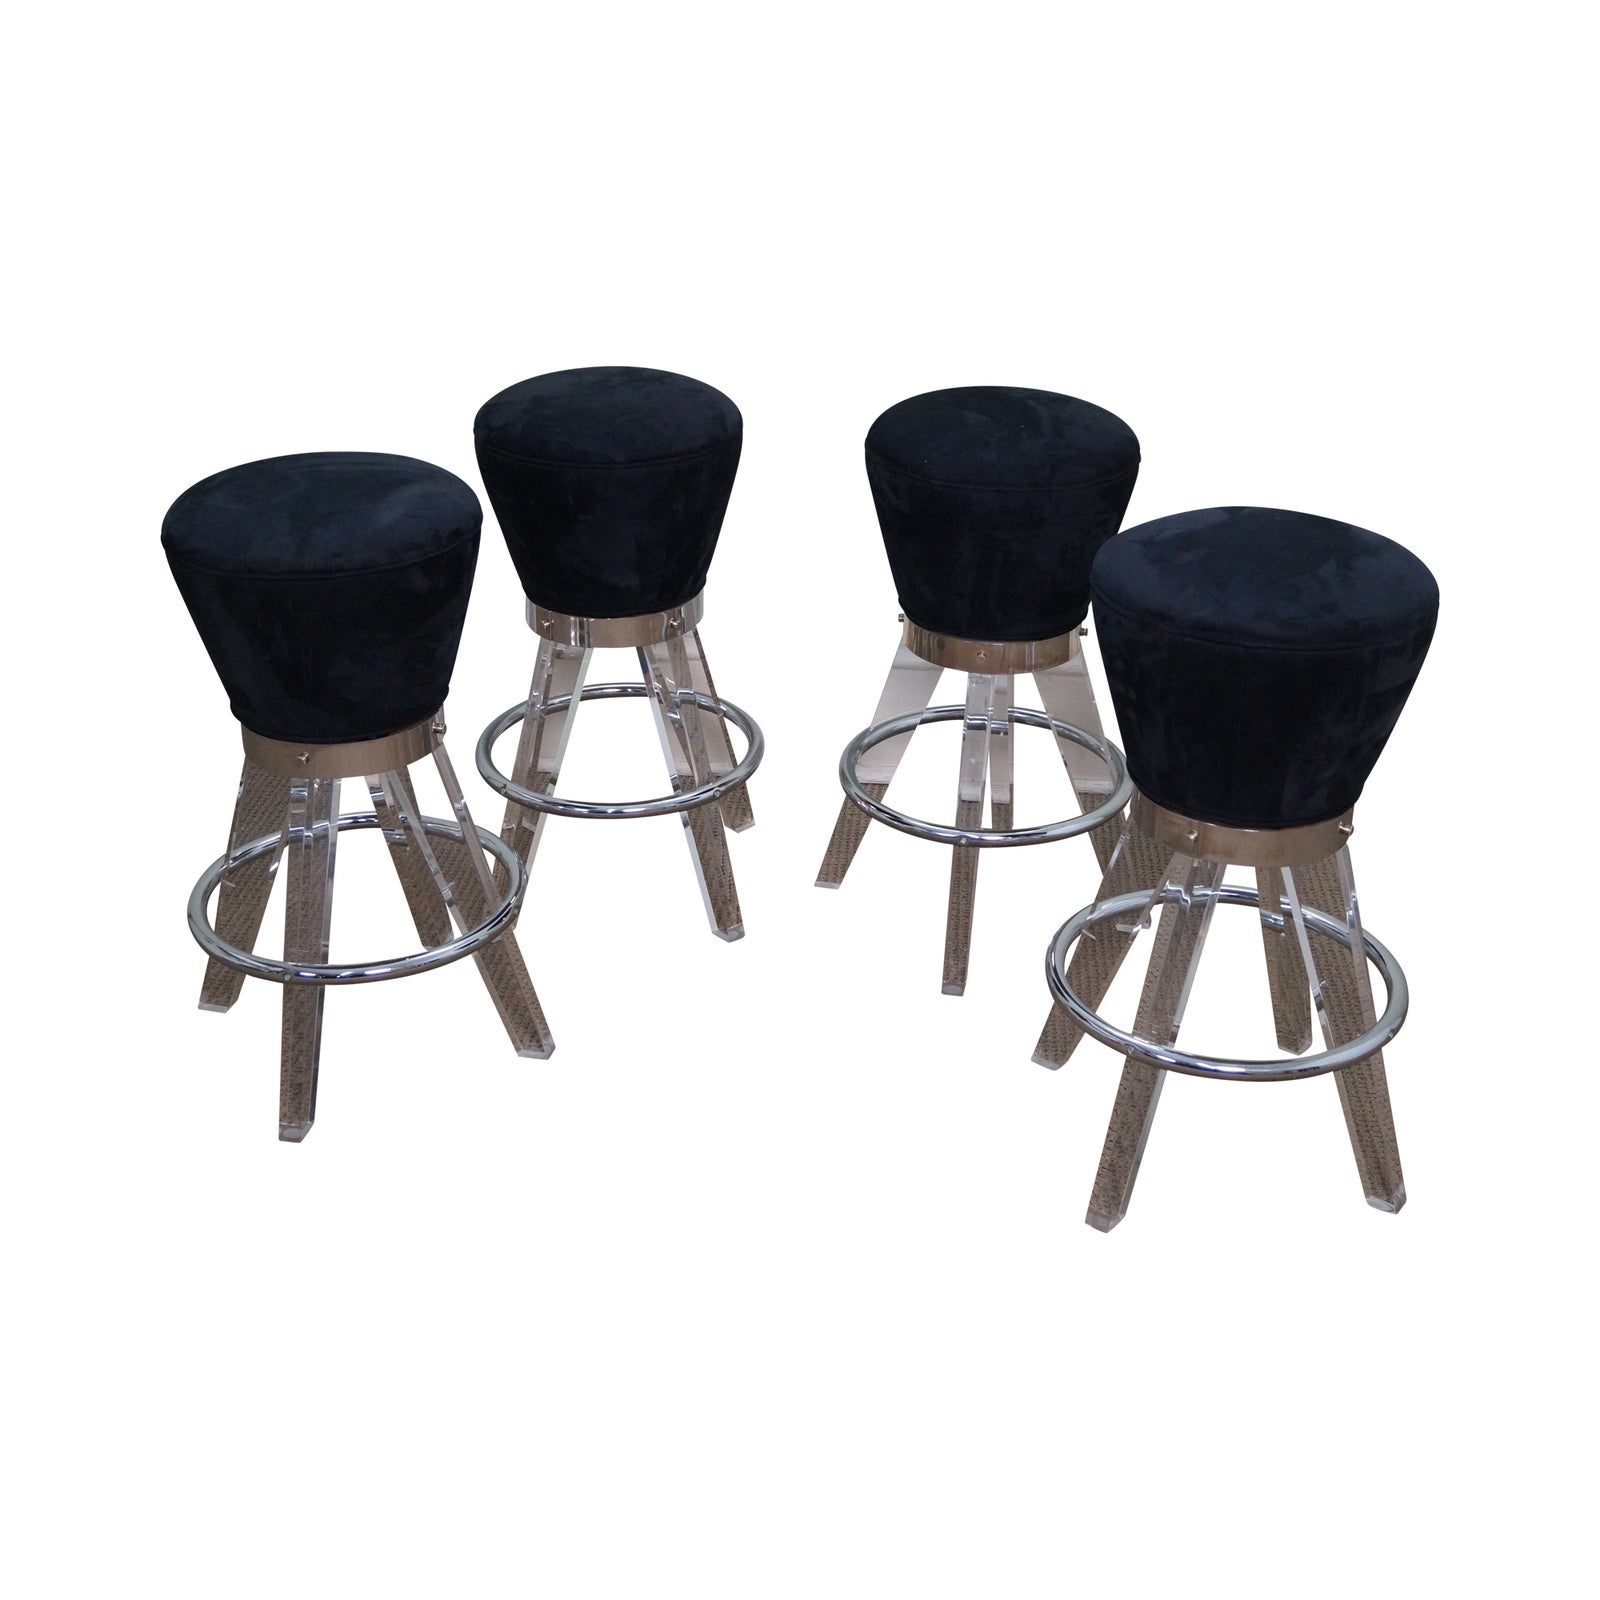 h studio lucite gumdrop bar stoolshaziza  set of 4